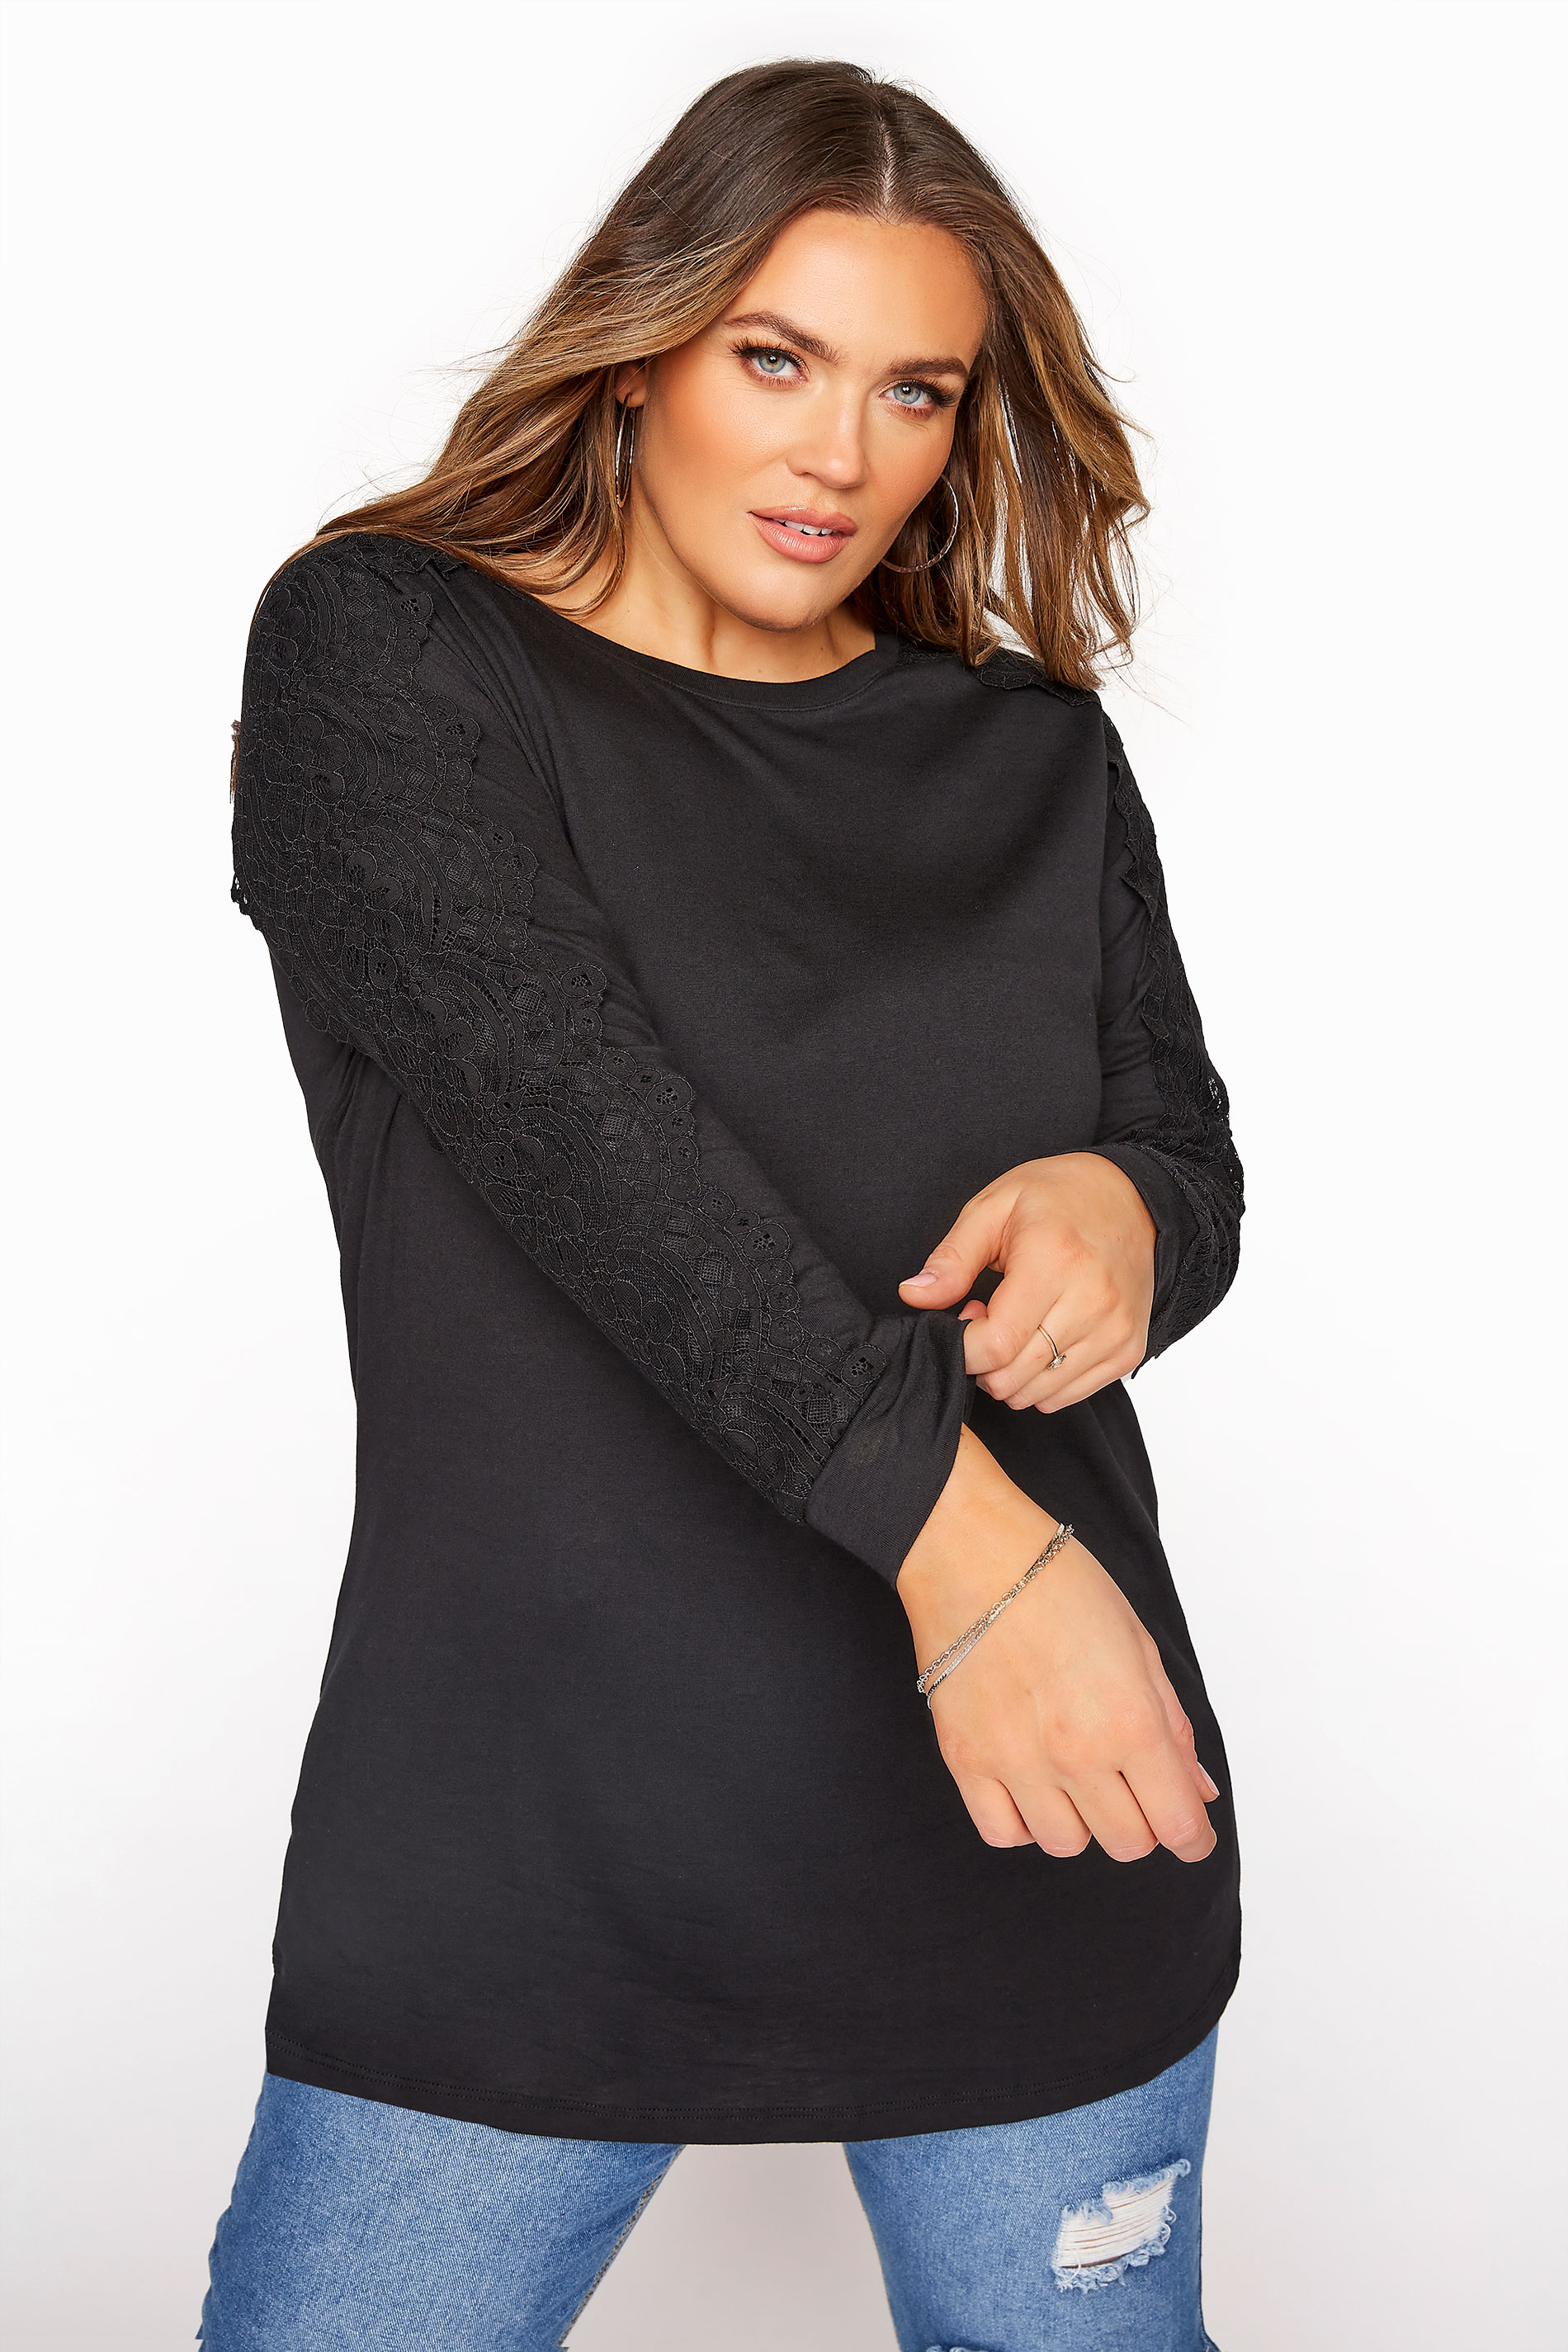 Black Lace Overarm Top